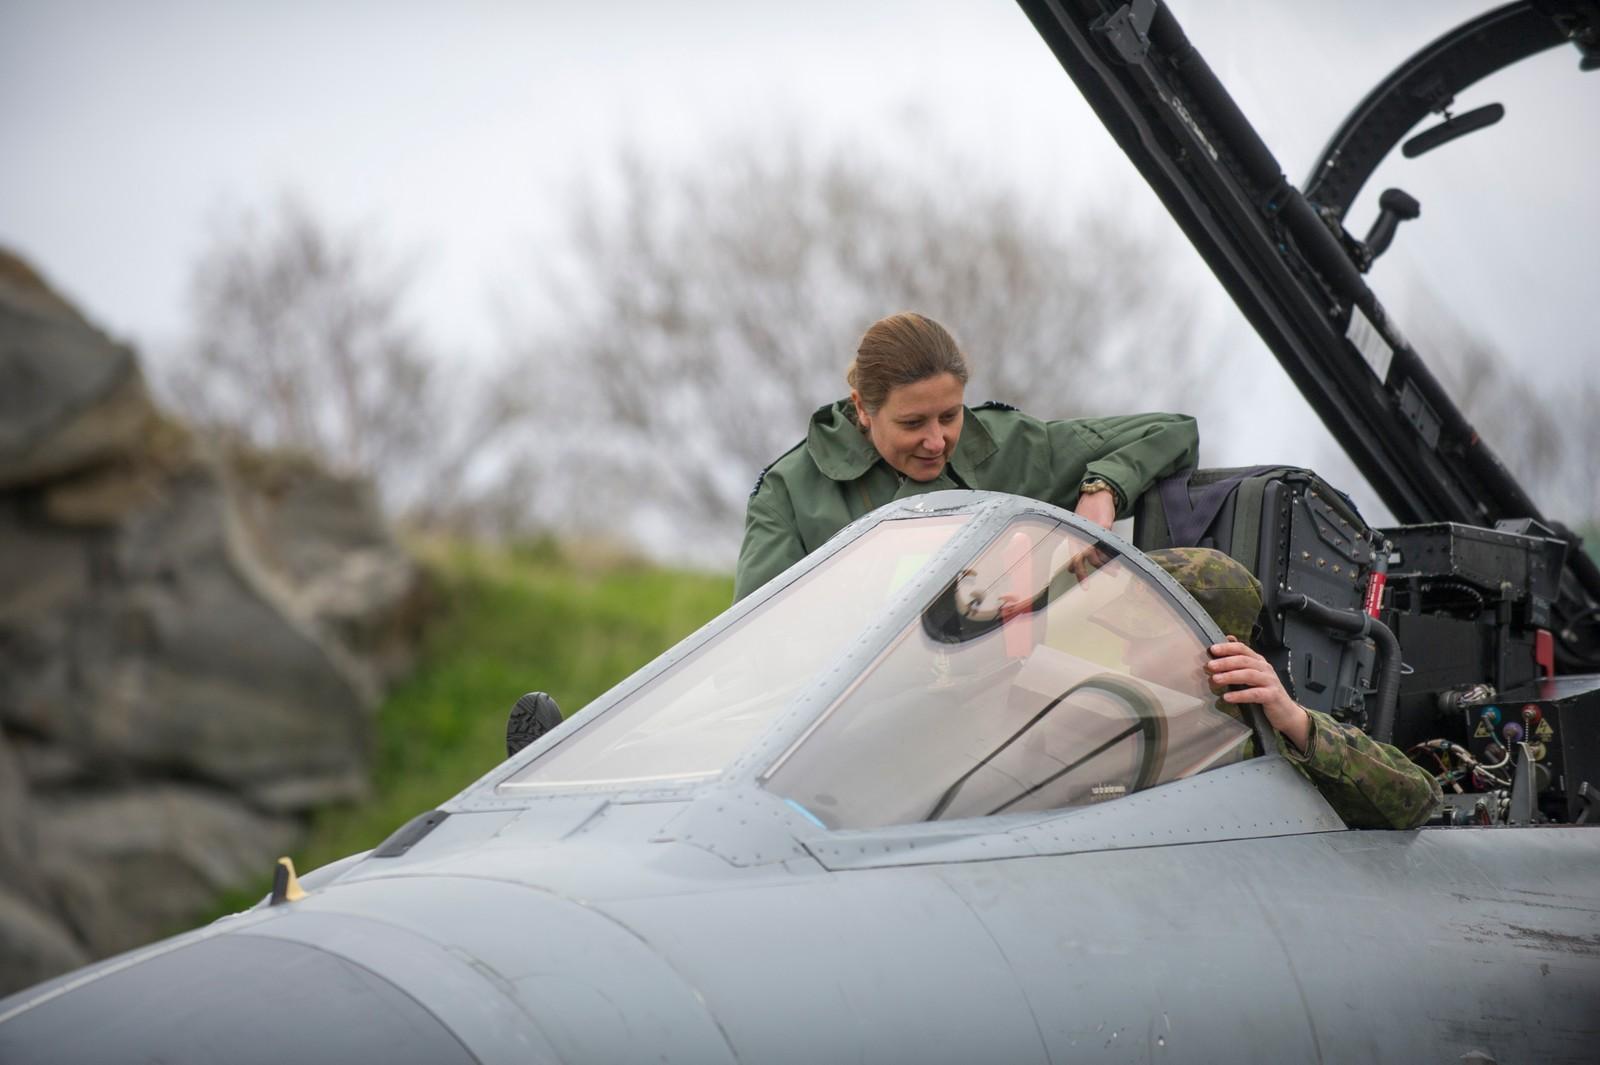 Den britiske detasjementsjefen viser journalistene flyet Tornado, under øvelse ACE17 i Bodø.